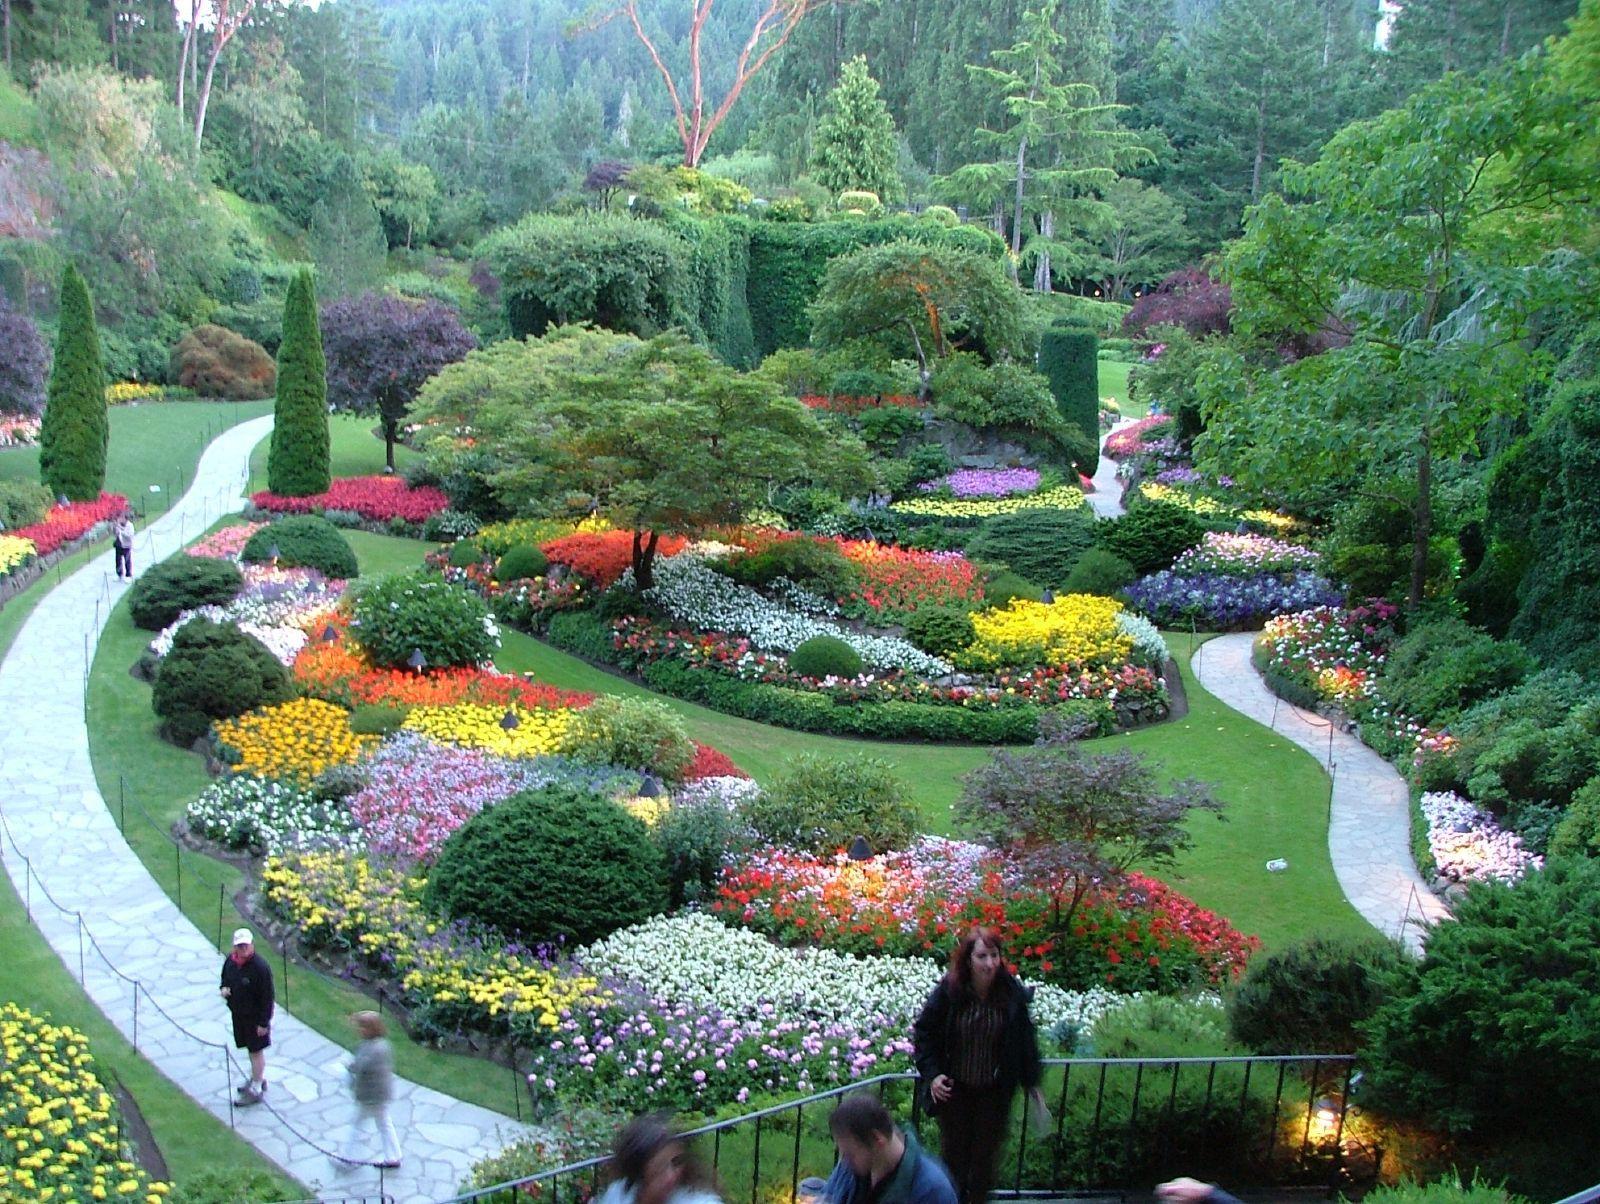 e92ed1ba1635ee93916980c976f3b6cc - How Much Is Admission To Butchart Gardens